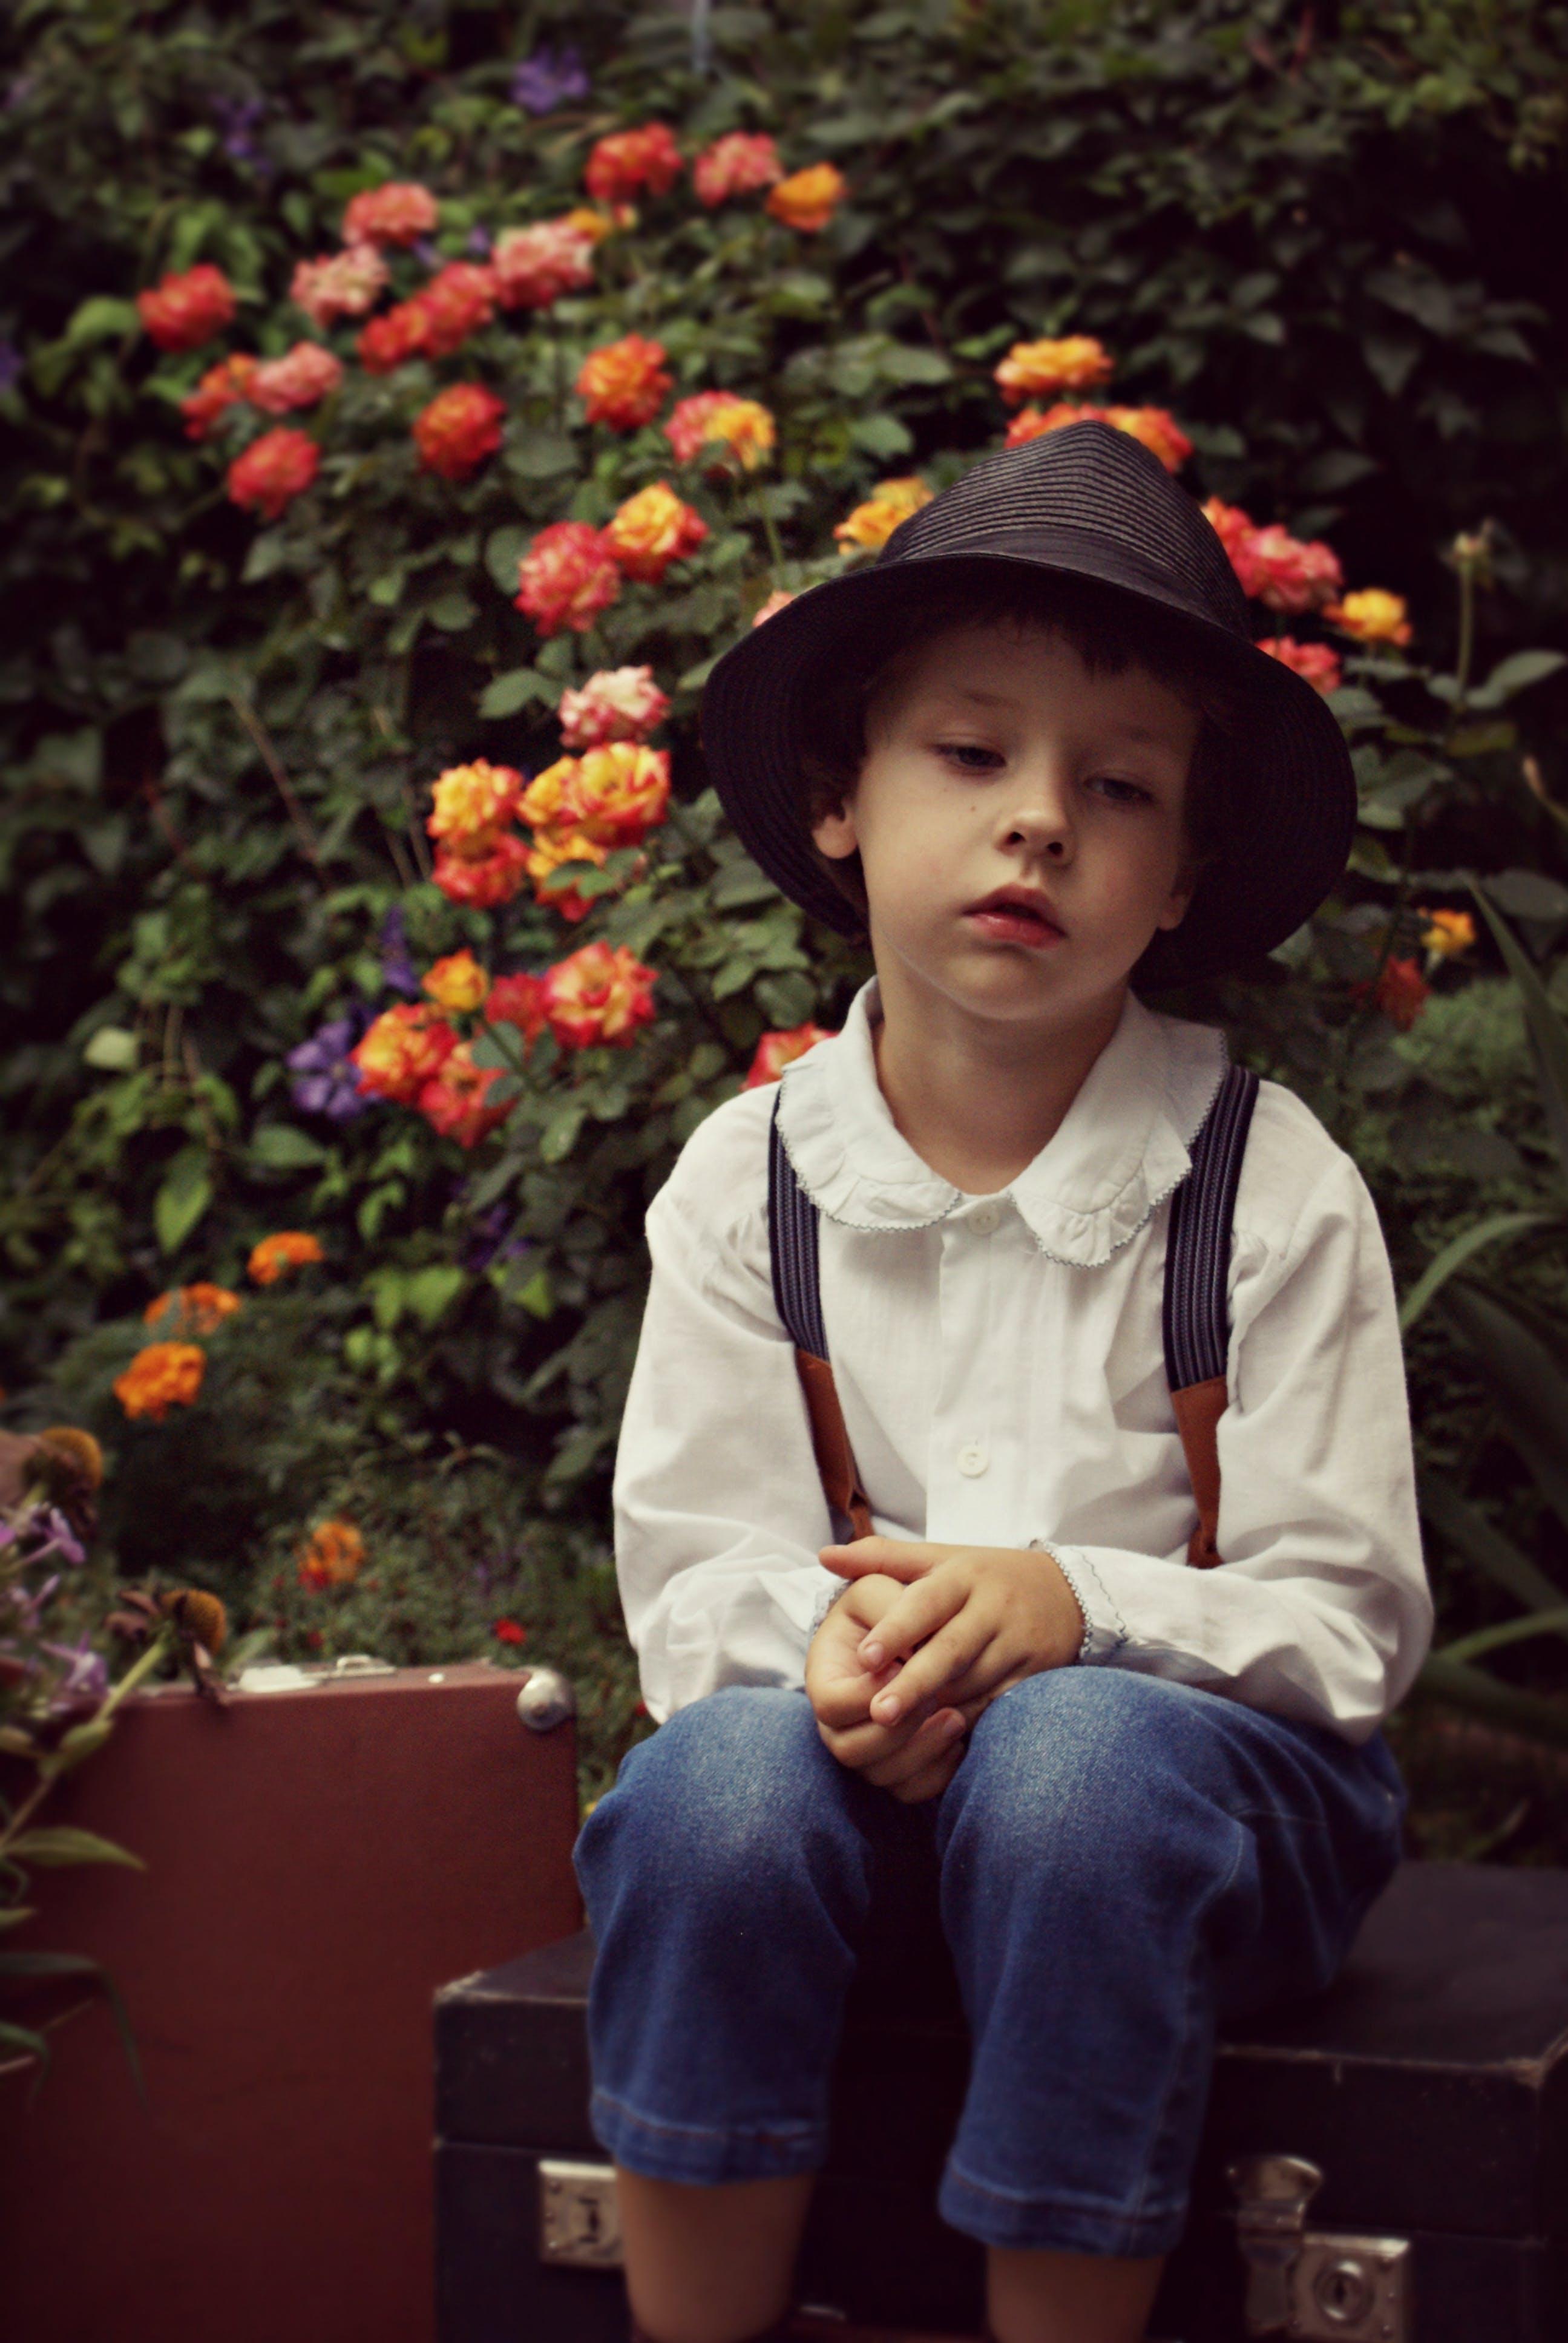 Photo Of Boy Sitting Alone